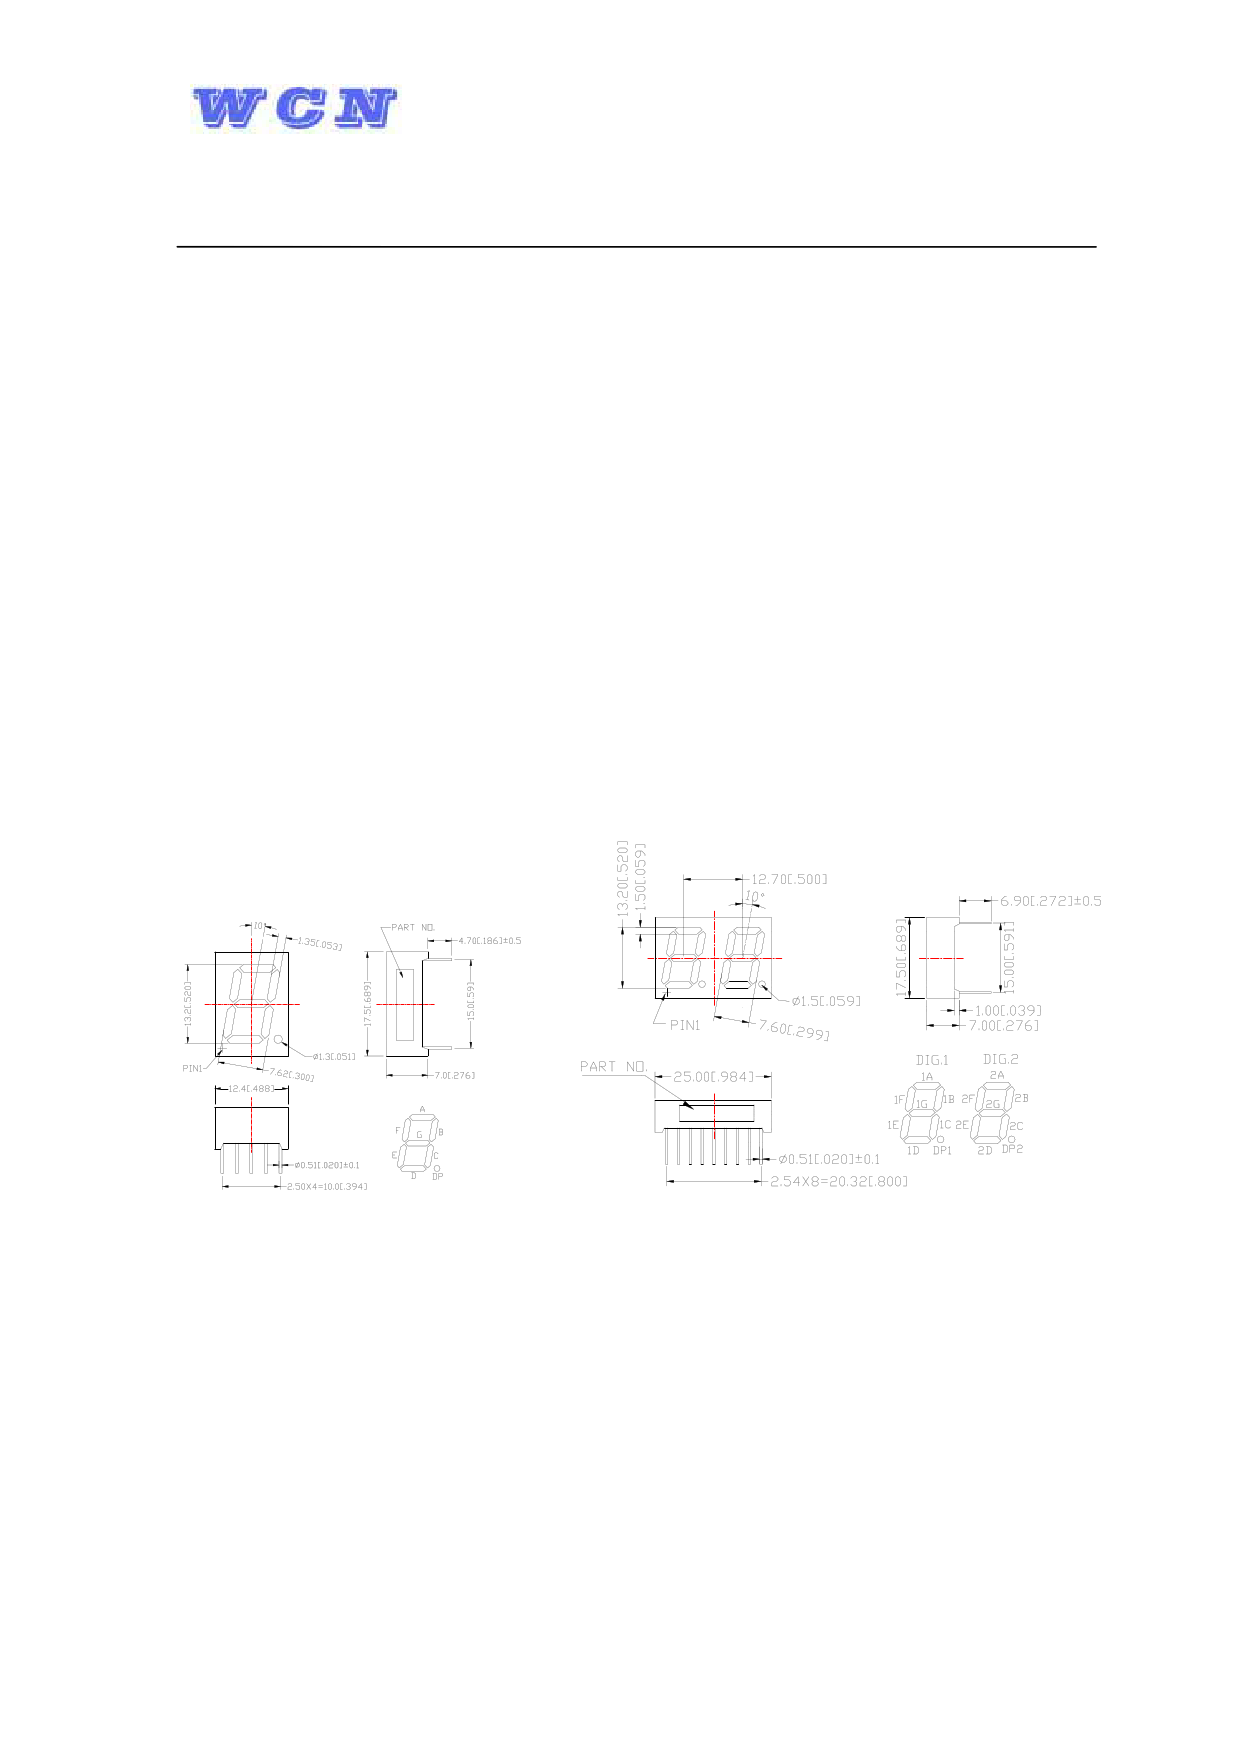 WCN4-0052SR-C11 datasheet